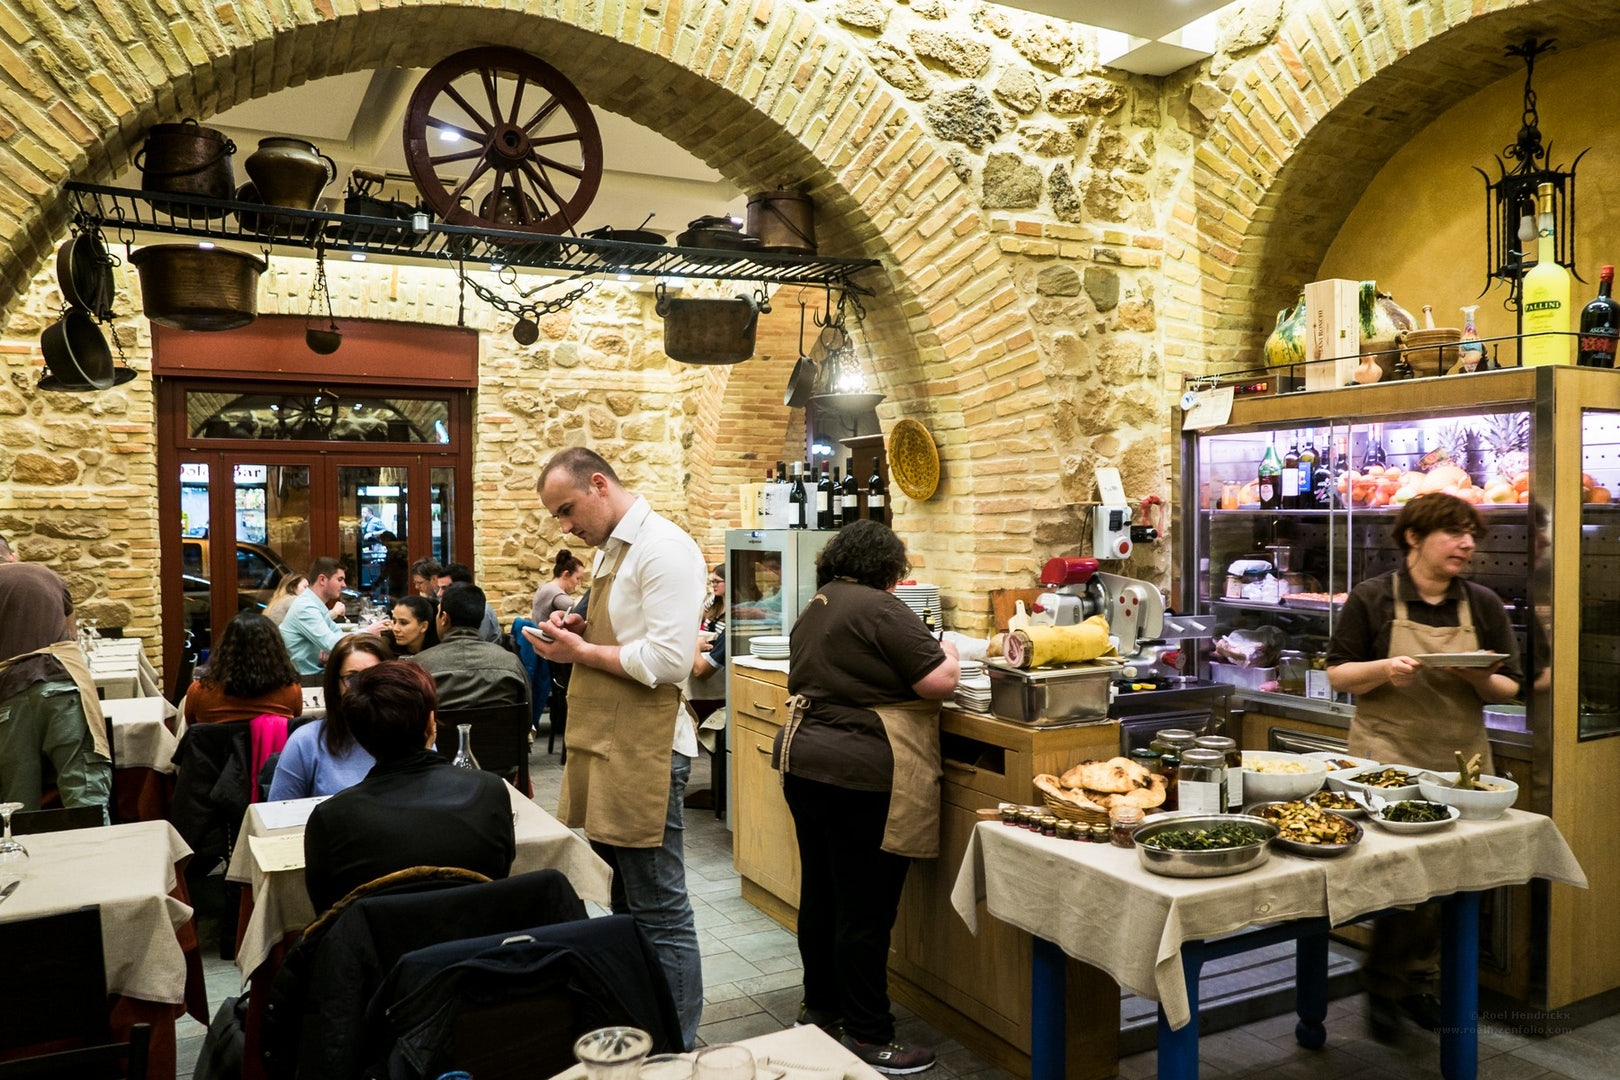 interior or La Tavernaccia restaurant in Rome